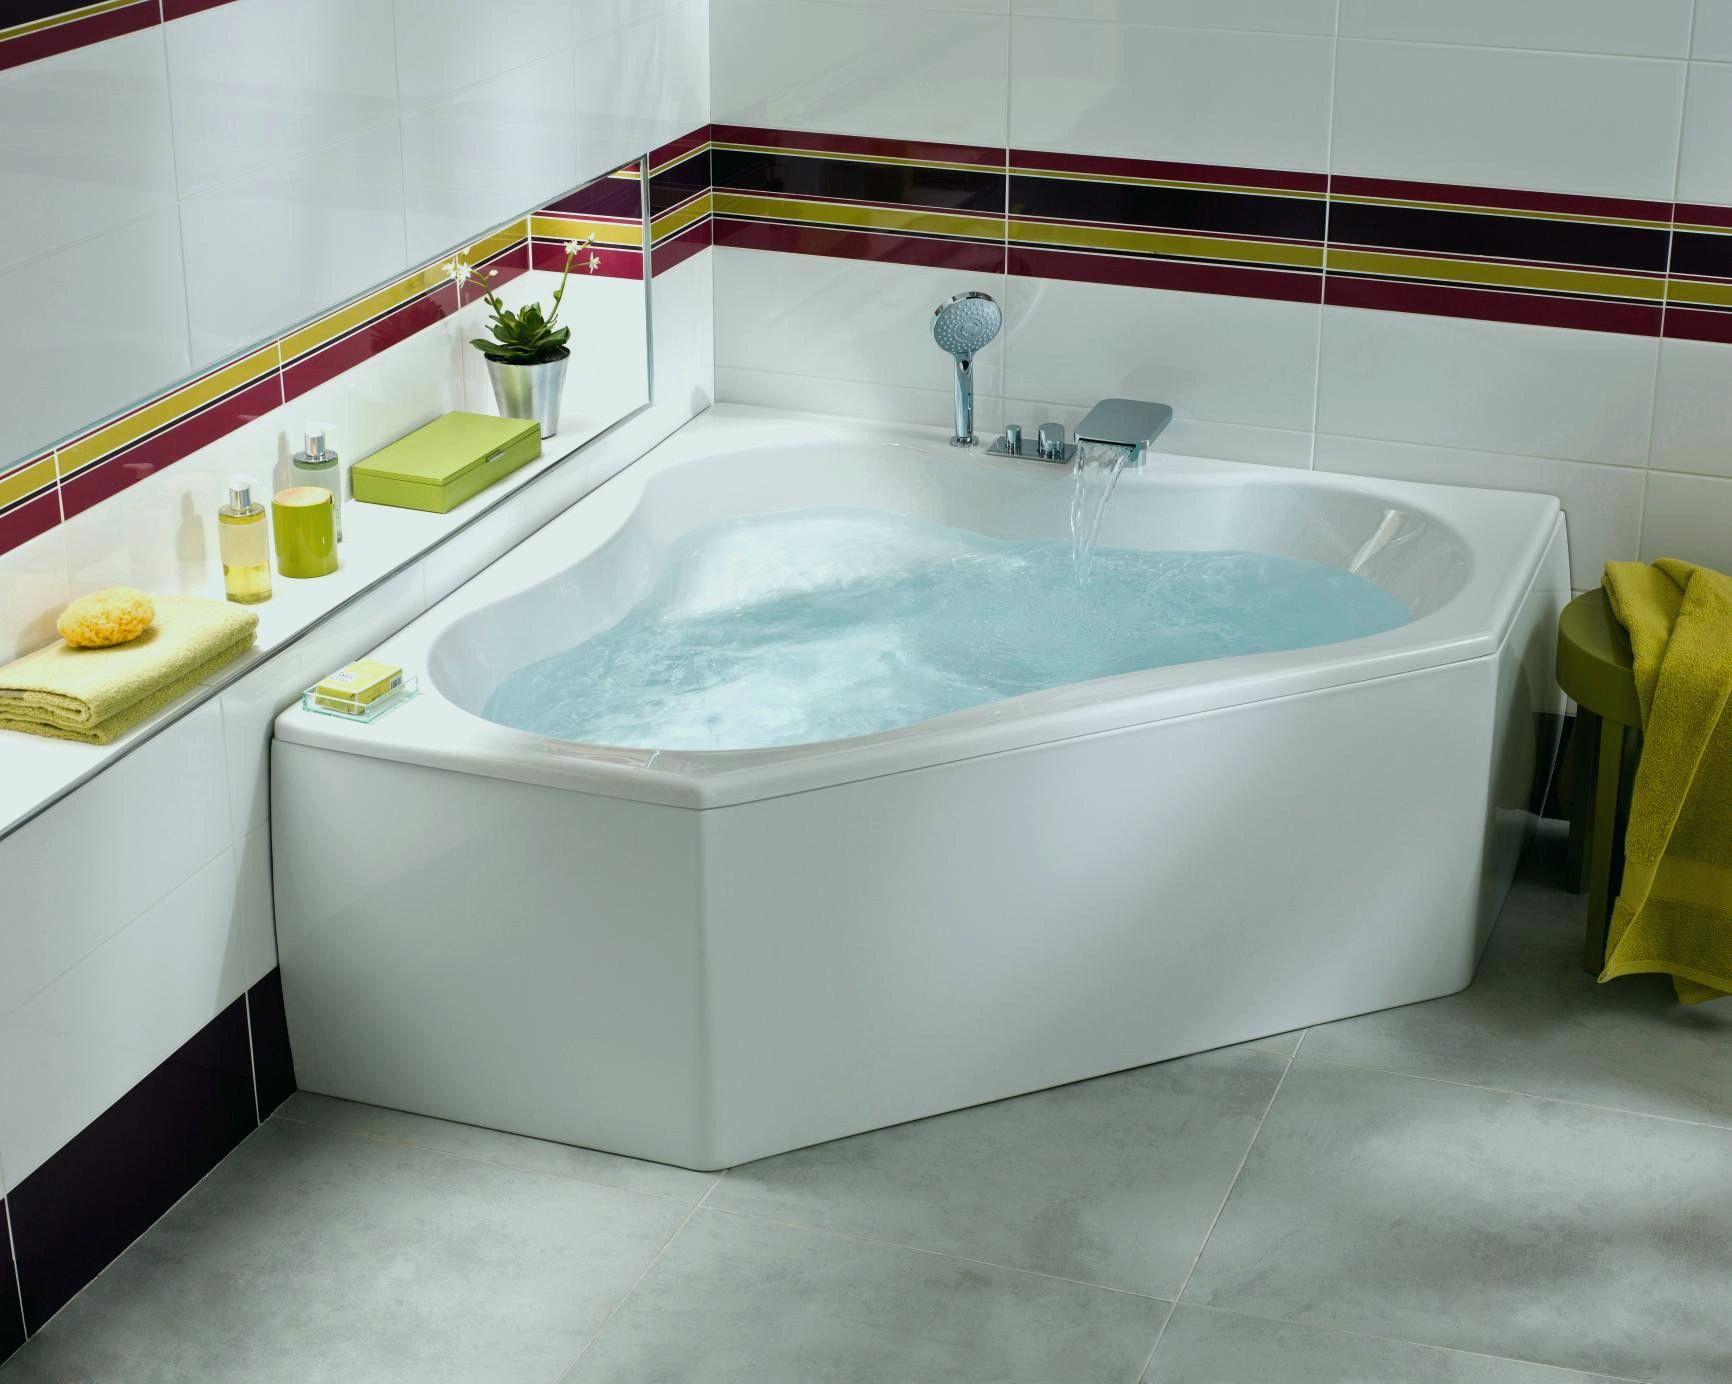 Baignoire 140 X 80 Baignoire 140 X 80 Baignoire Balneo D Angle 140 X 140 Hydromassante Baignoire Balneo Bathroom Design Layout Corner Bath Bathrooms Remodel